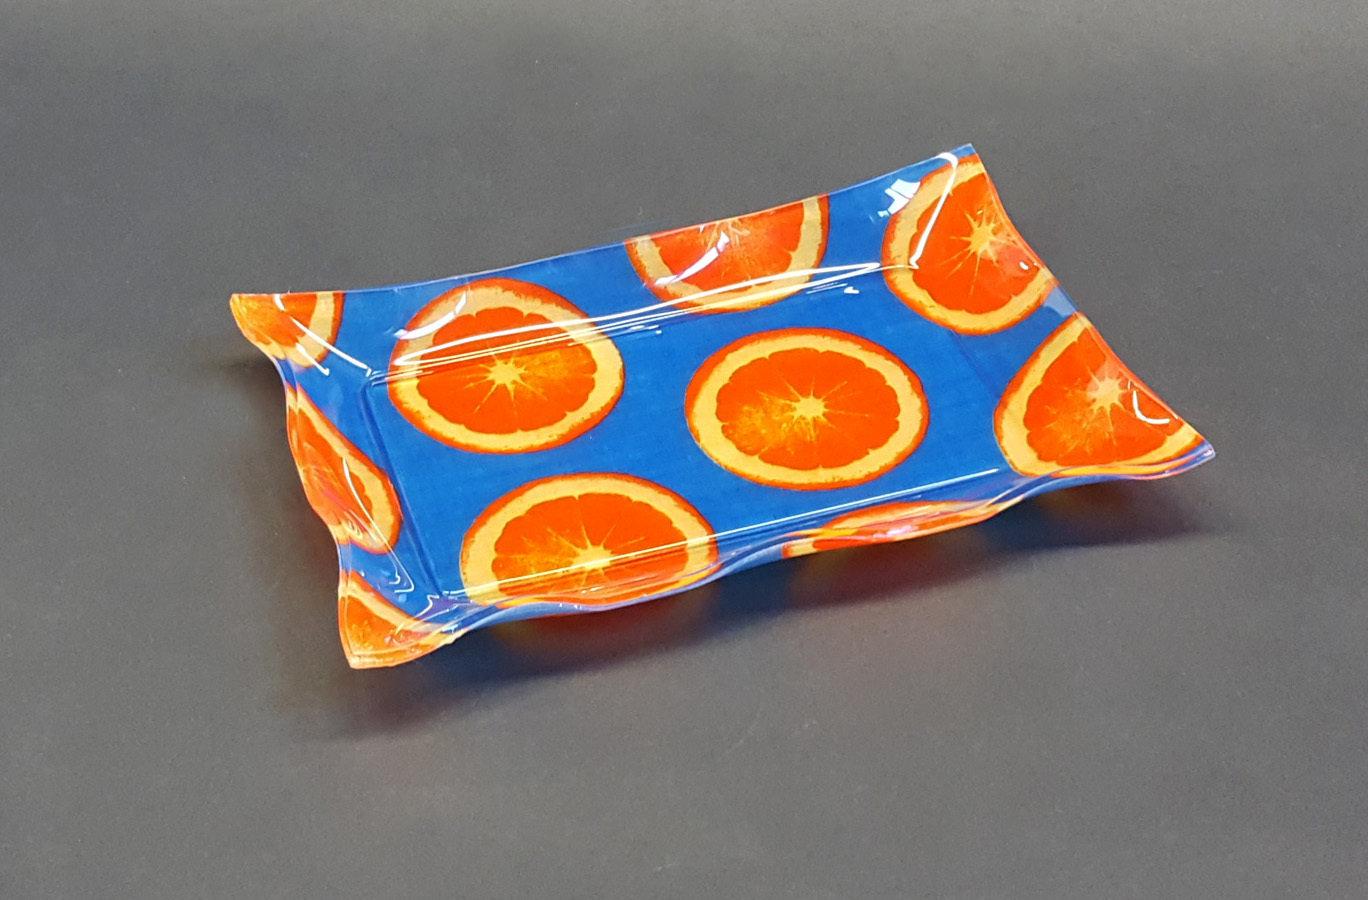 "Vuotatasche - vassoietto in plexiglass con tessuto ""Blue orange"""